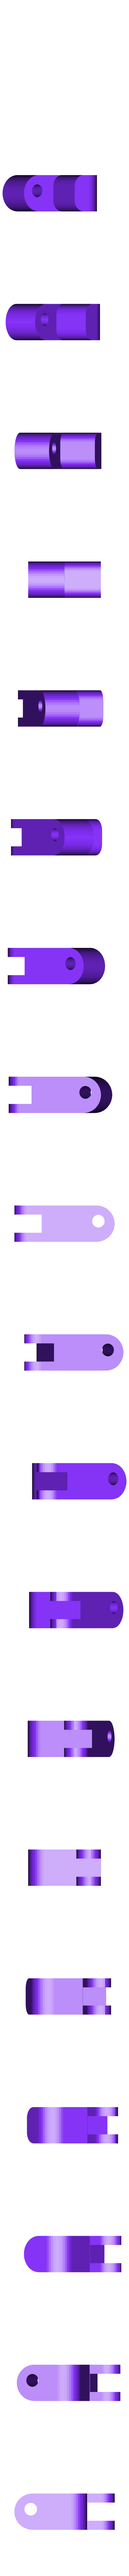 vork-voet-r.stl Download free STL file trick (custom) • 3D printer model, jasperbaudoin